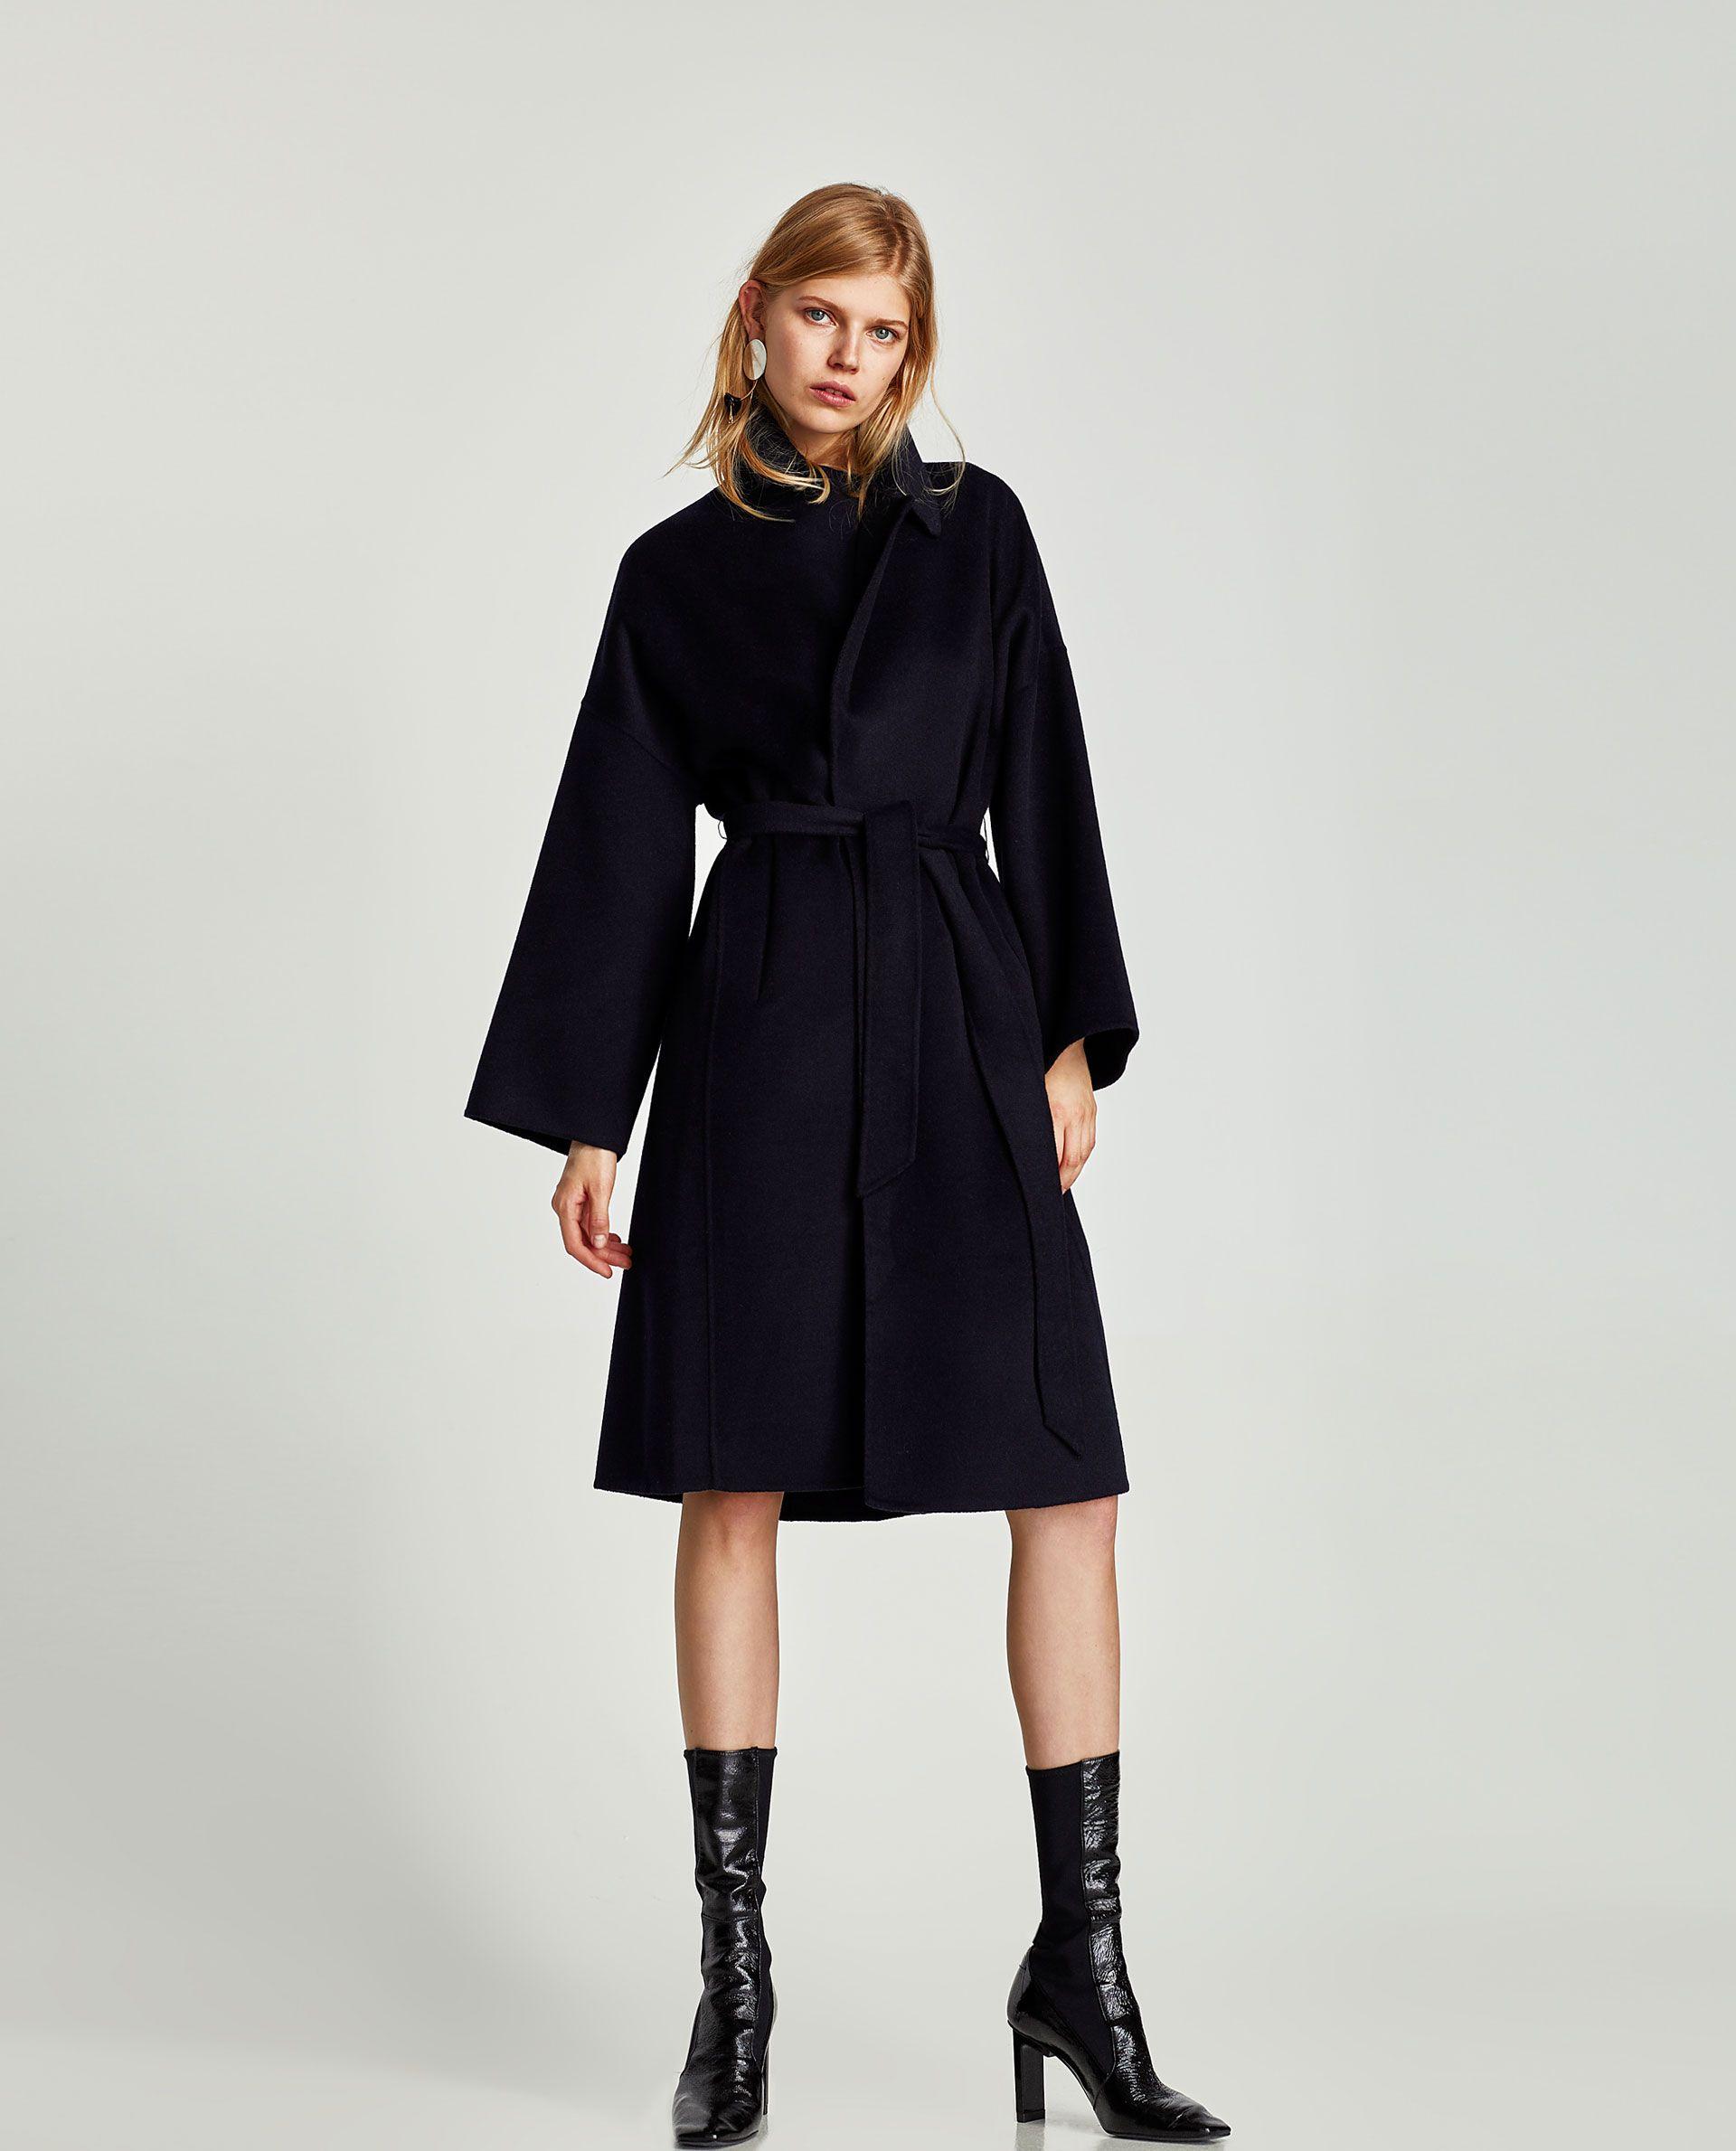 Cinturón Abrigo Pinterest Coat Long Kleding Largo Dames Wool OwqC5Rxq